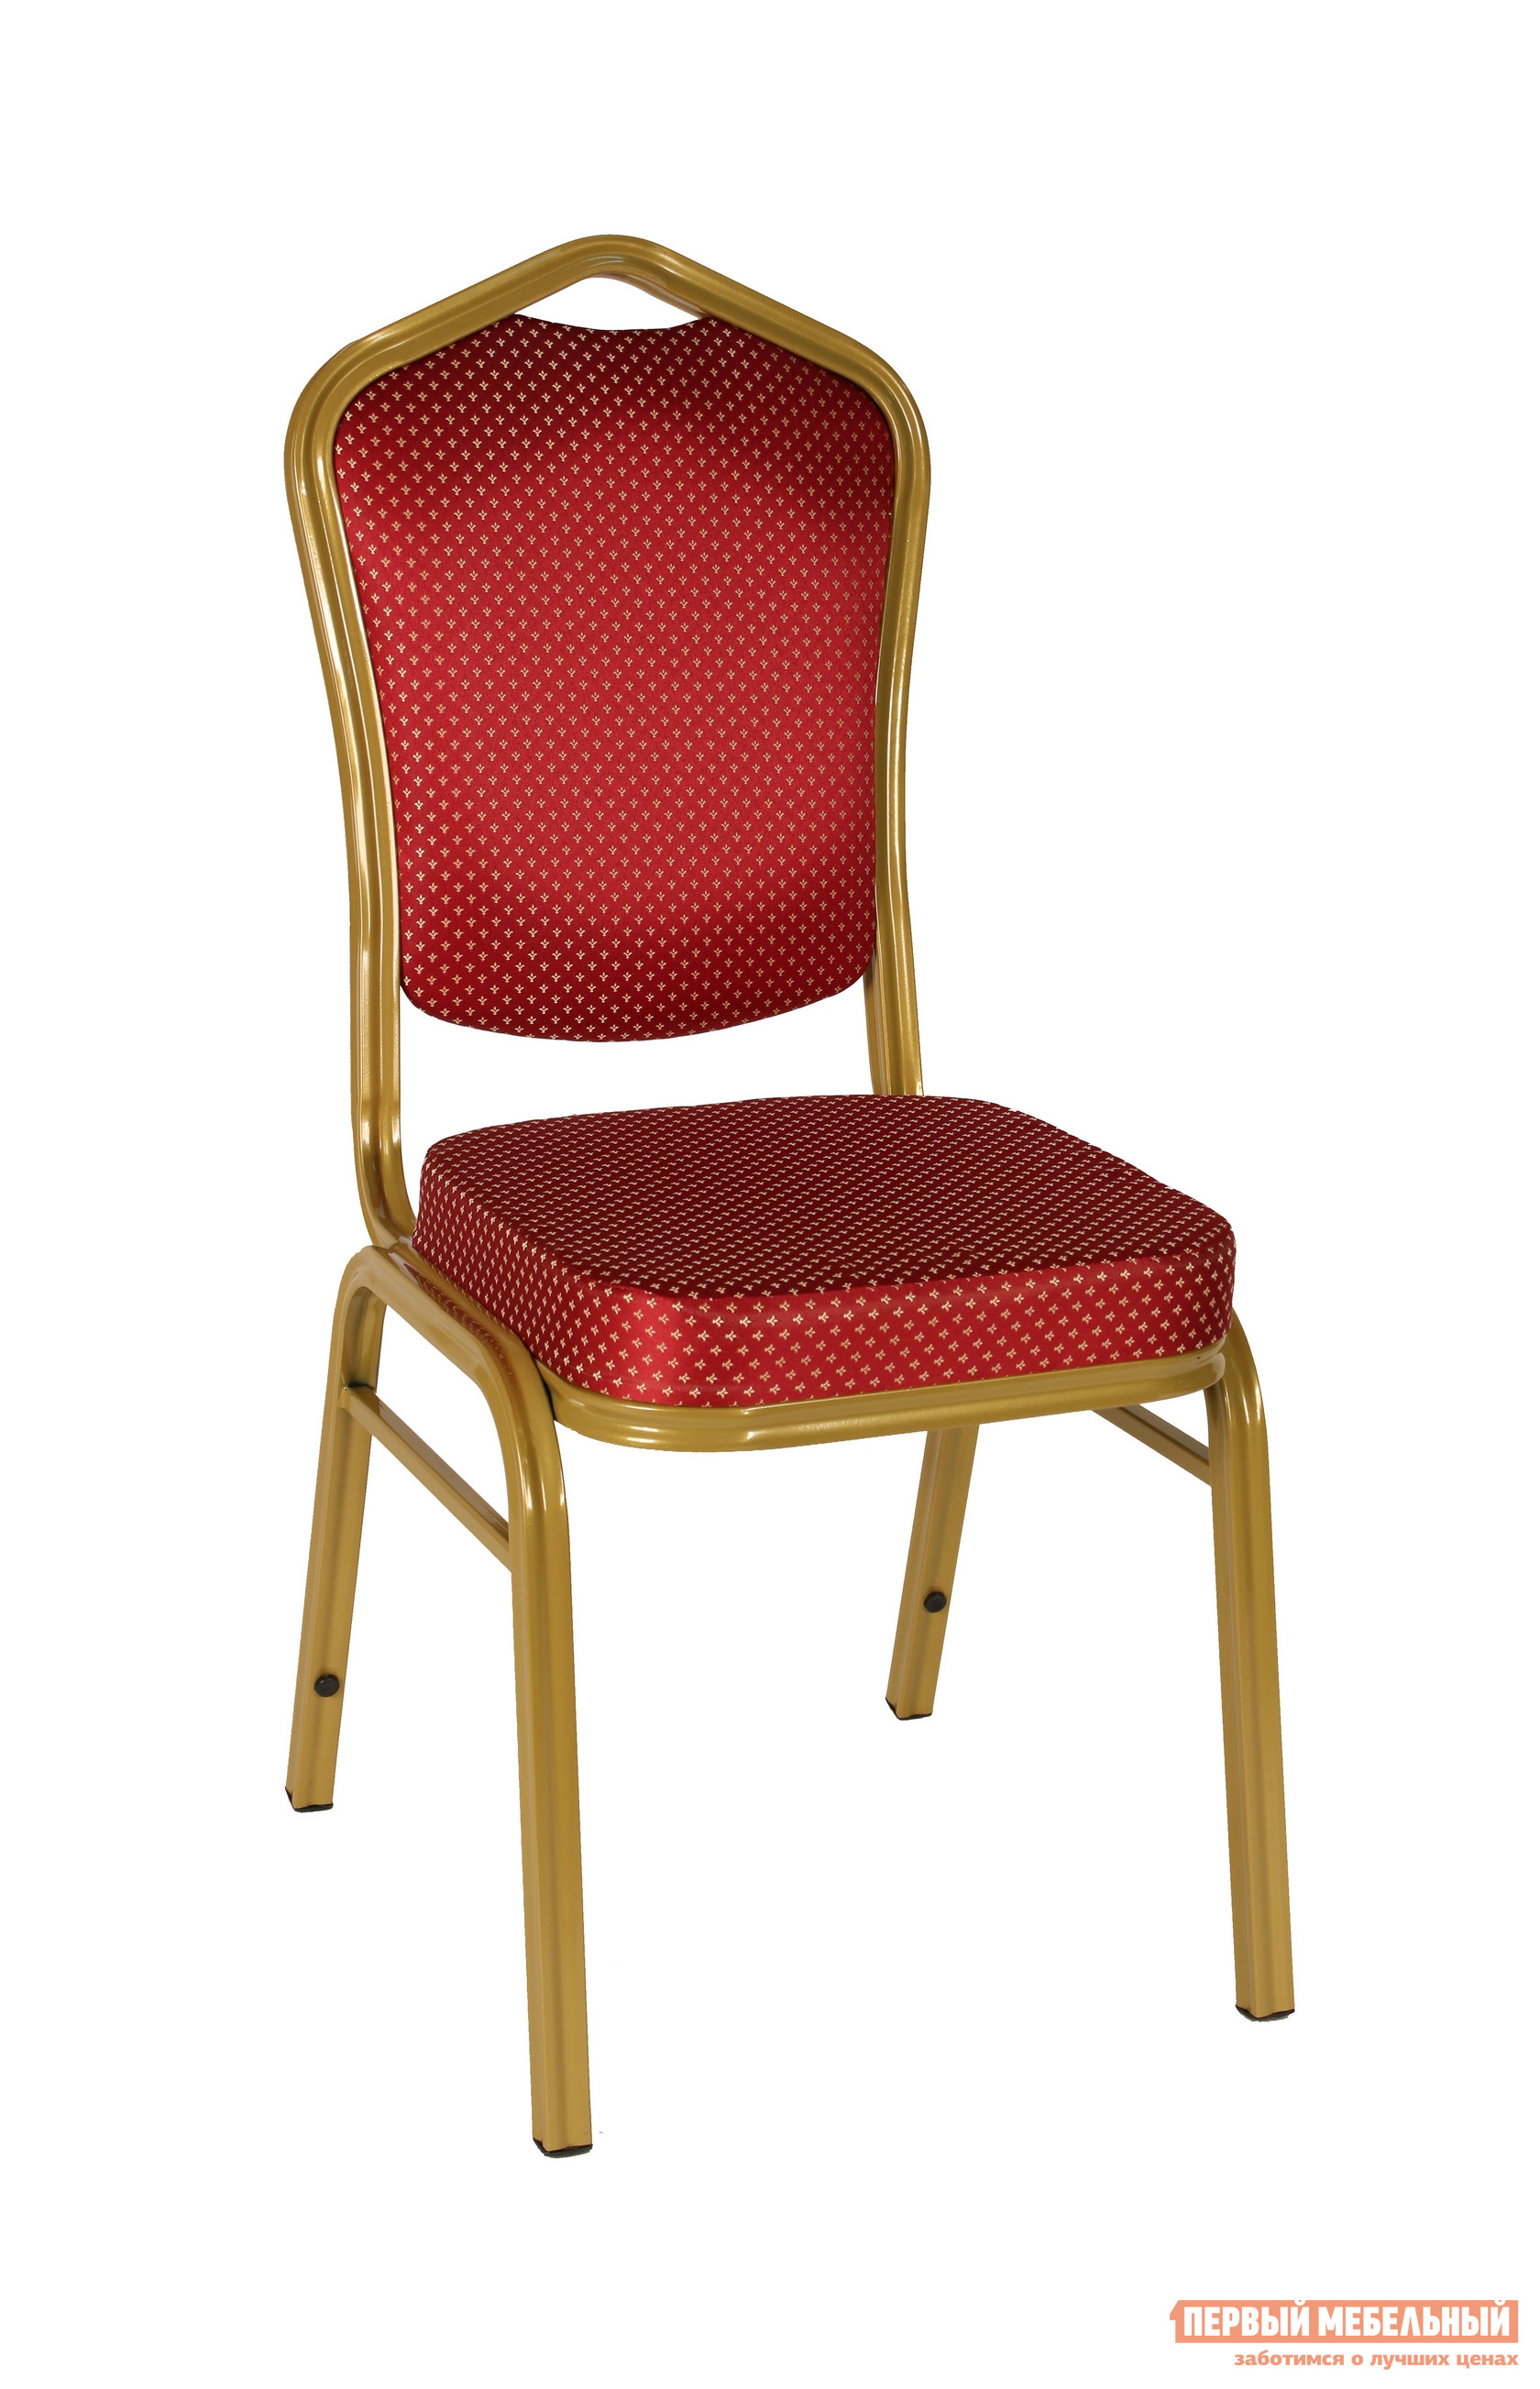 Кухонный стул STOOL GROUP Квадро Каркас золото / Обивка красная (узор короны) от Купистол